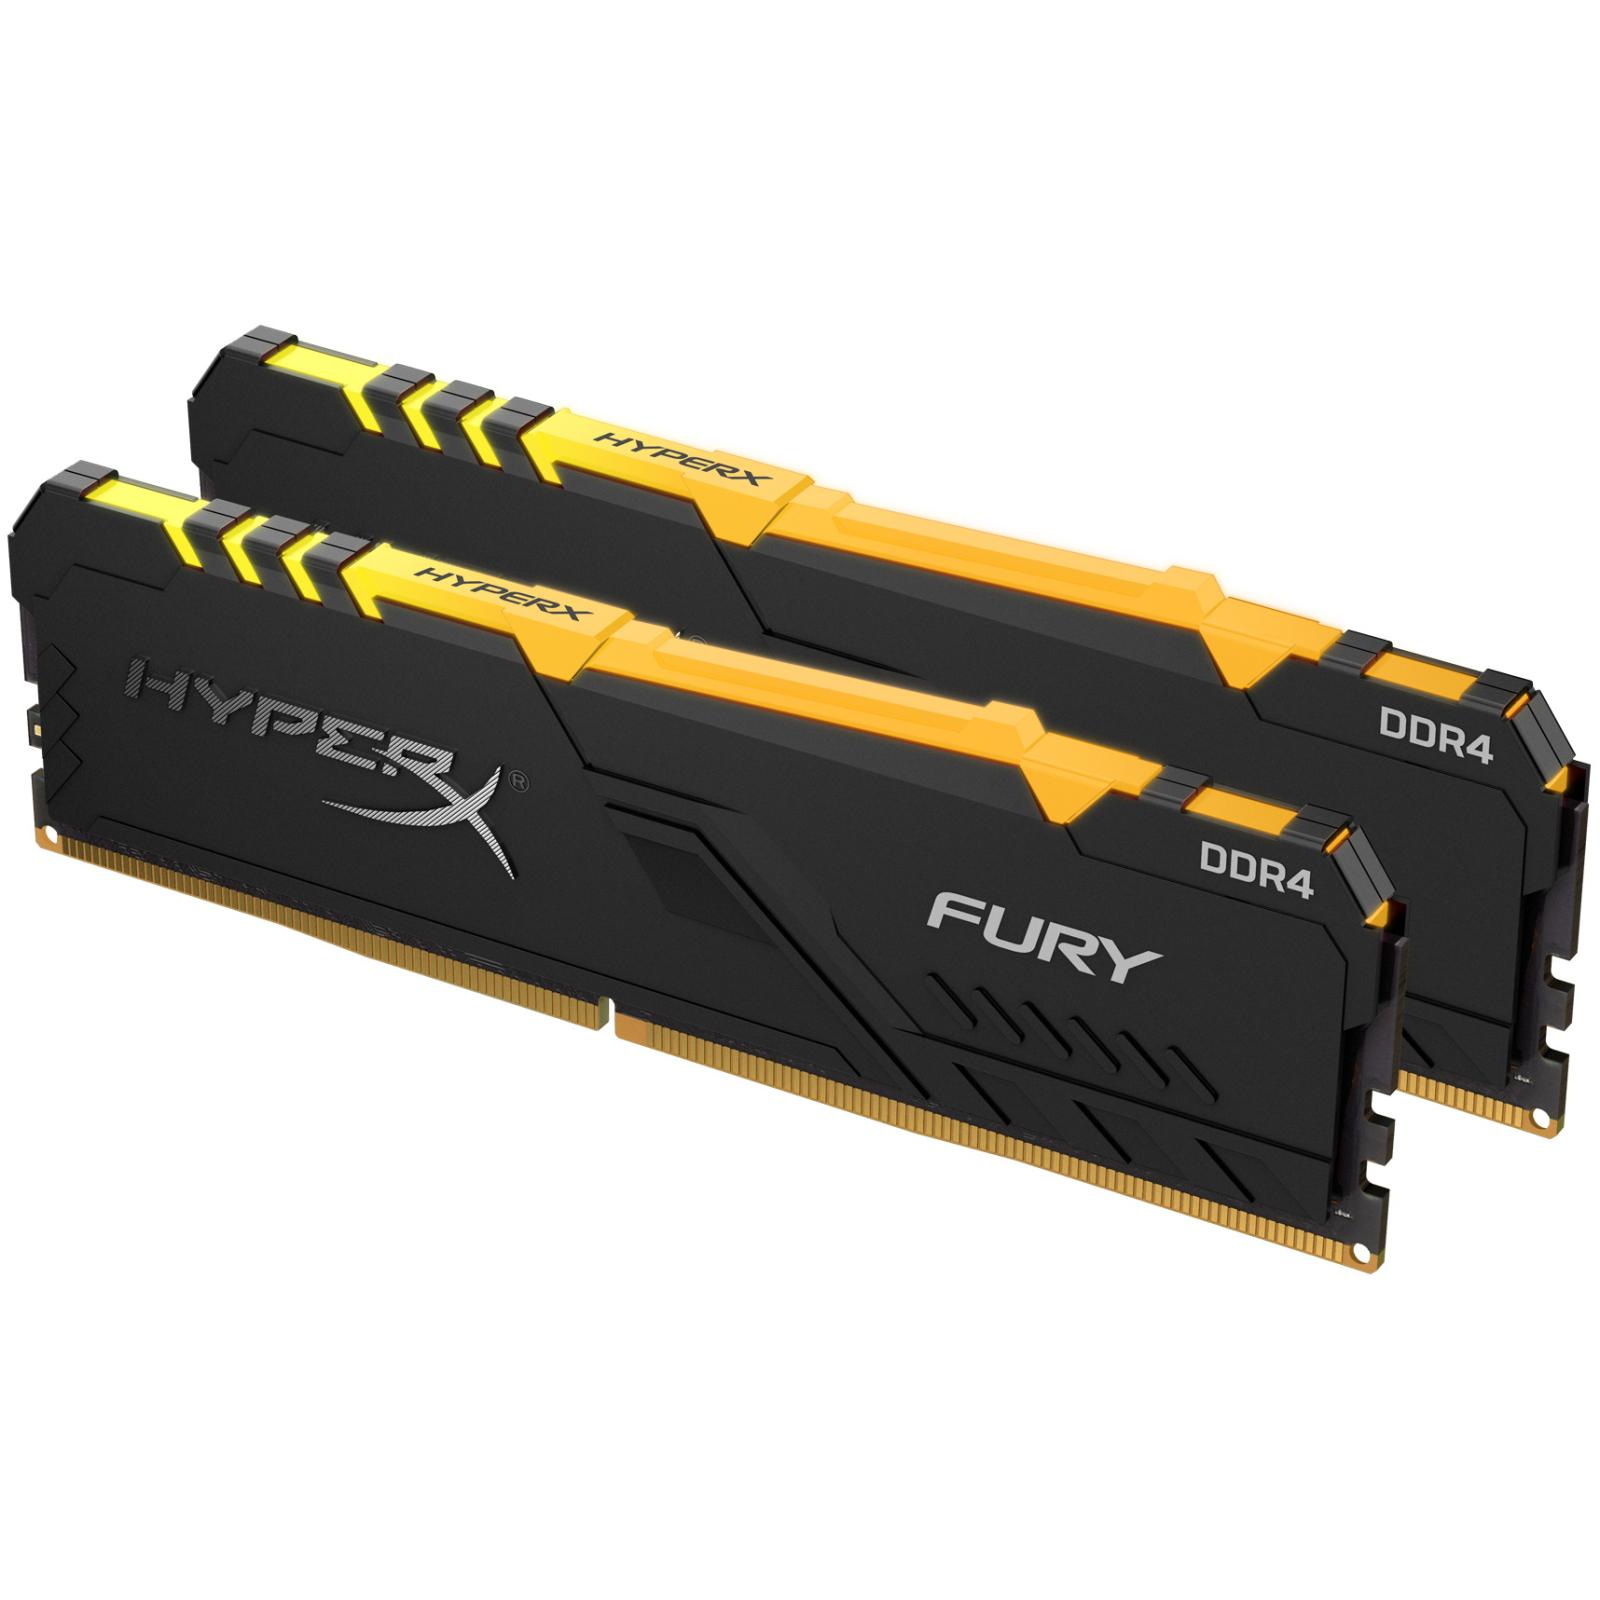 Модуль памяти для компьютера DDR4 32GB (2x16GB) 3733 MHz HyperX Fury RGB Kingston (HX437C19FB3AK2/32) изображение 3